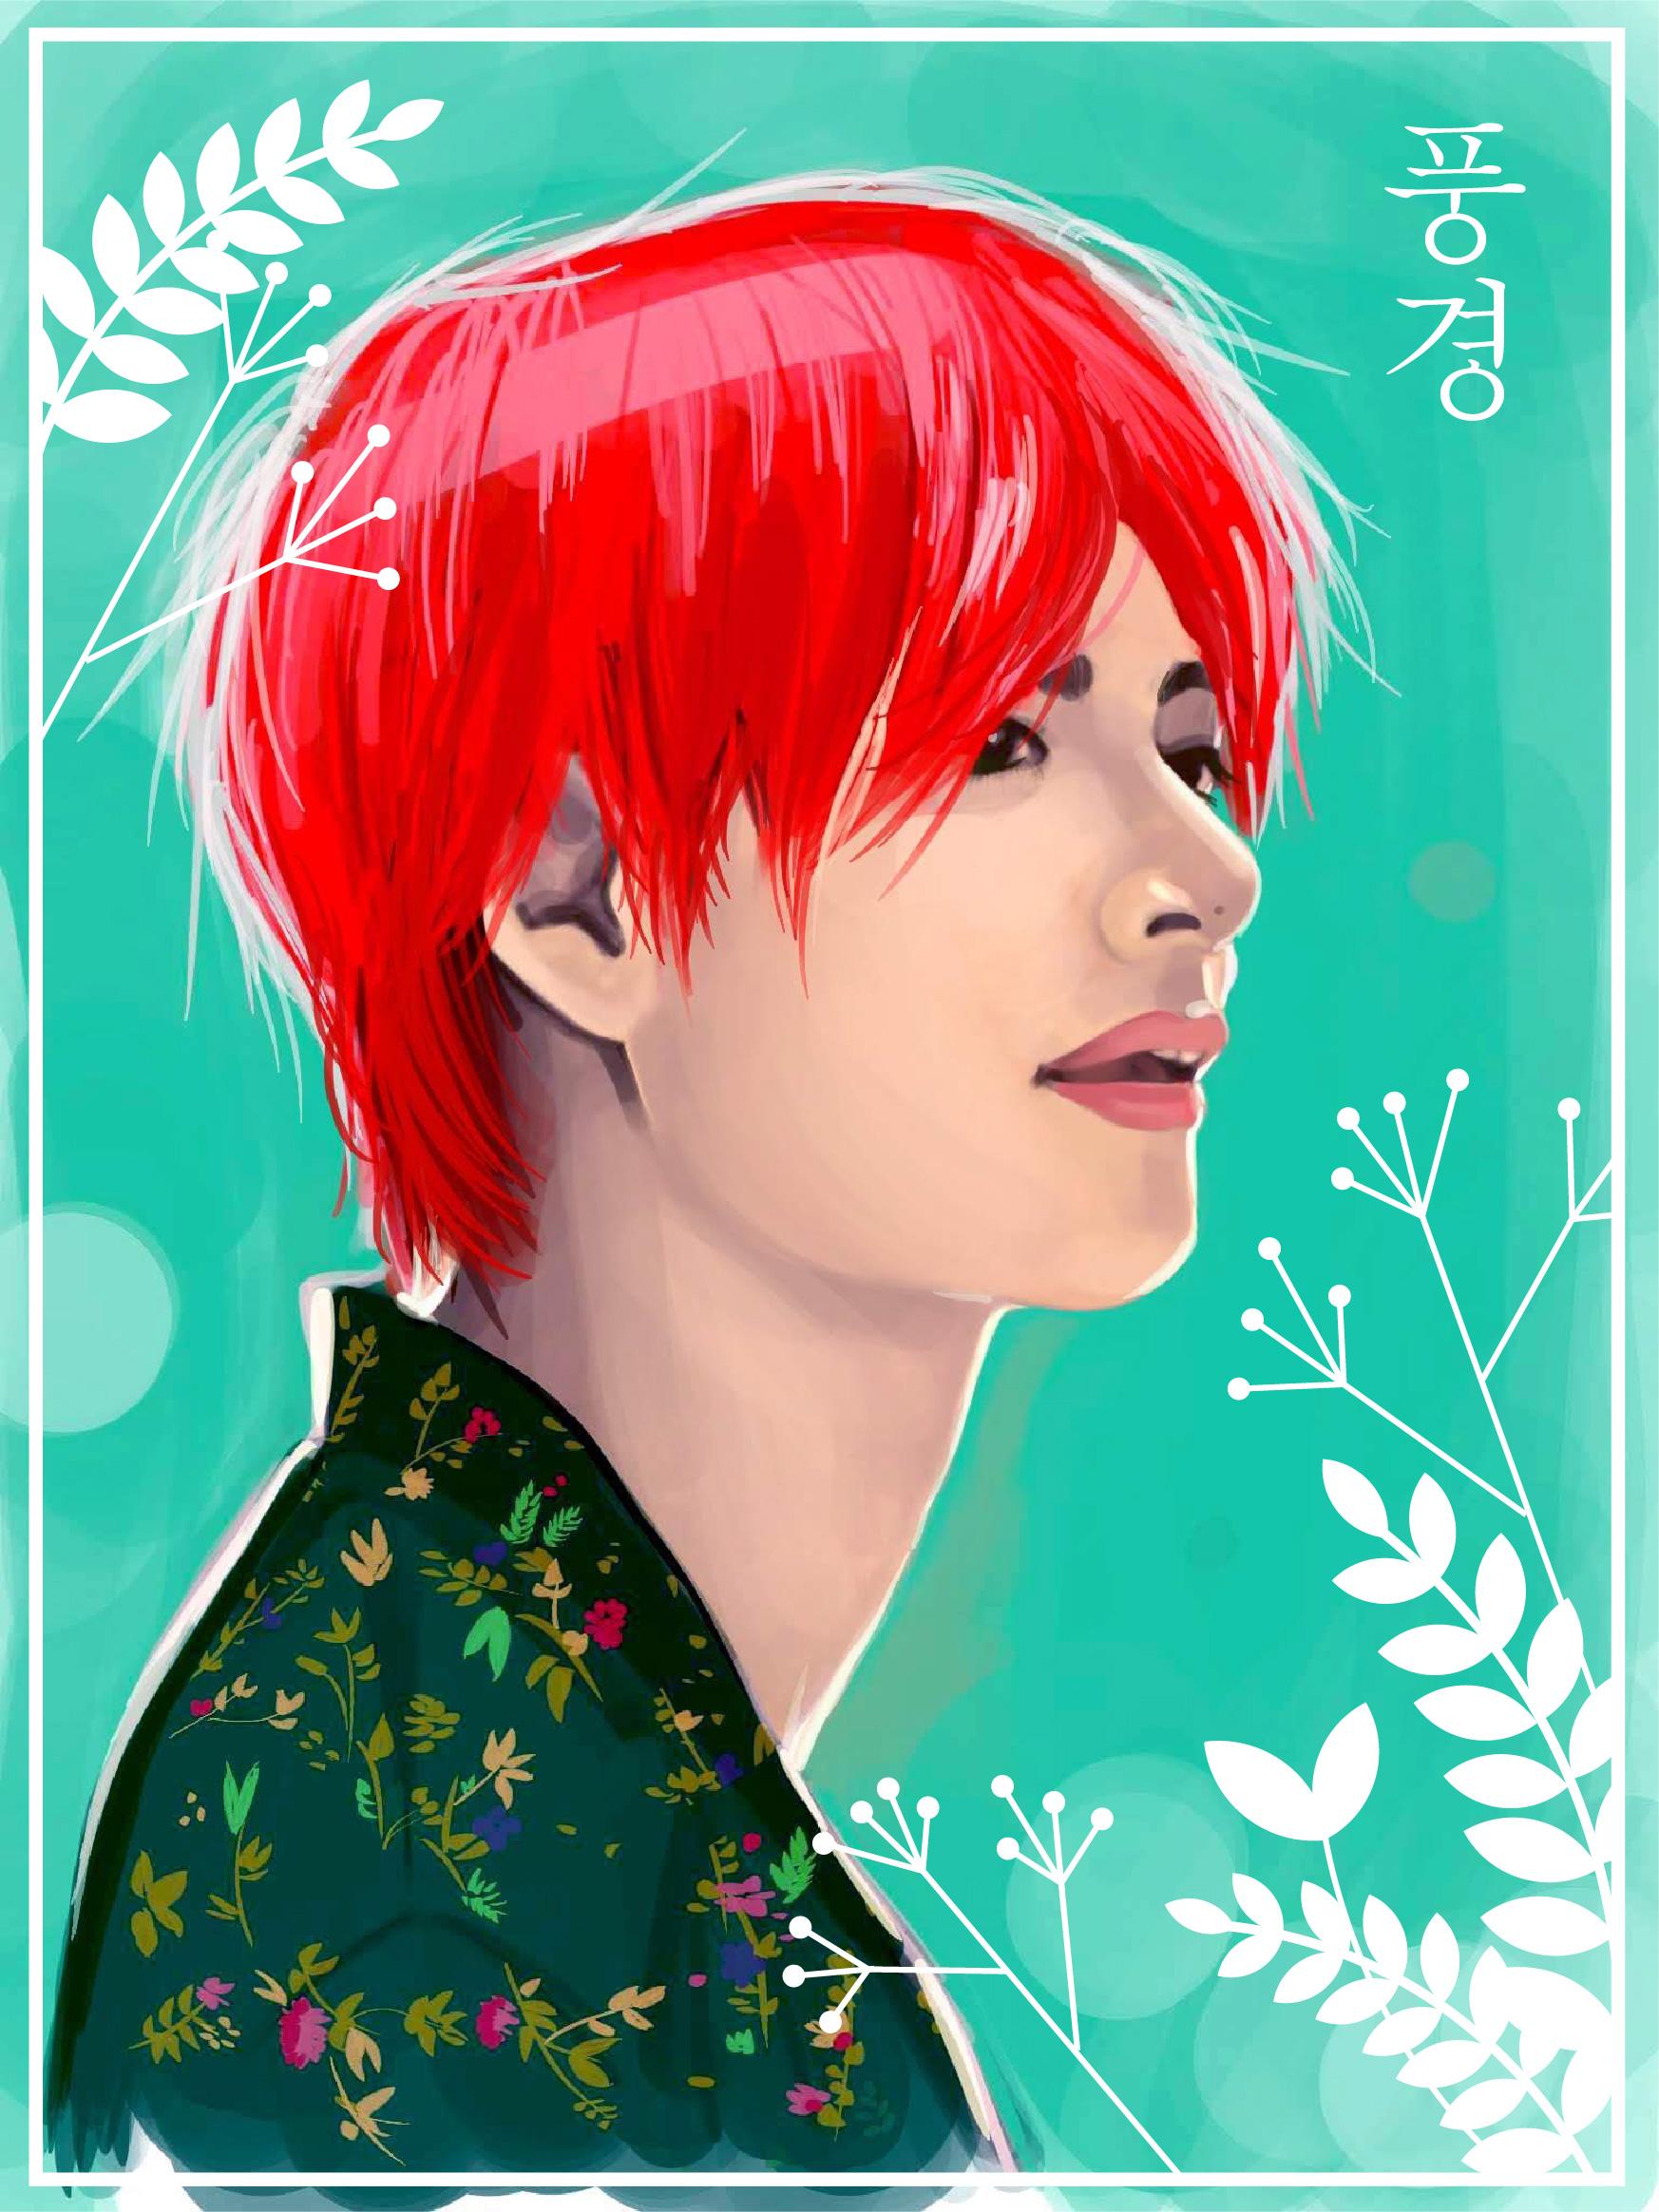 Taehyung_redhair_v4.jpg